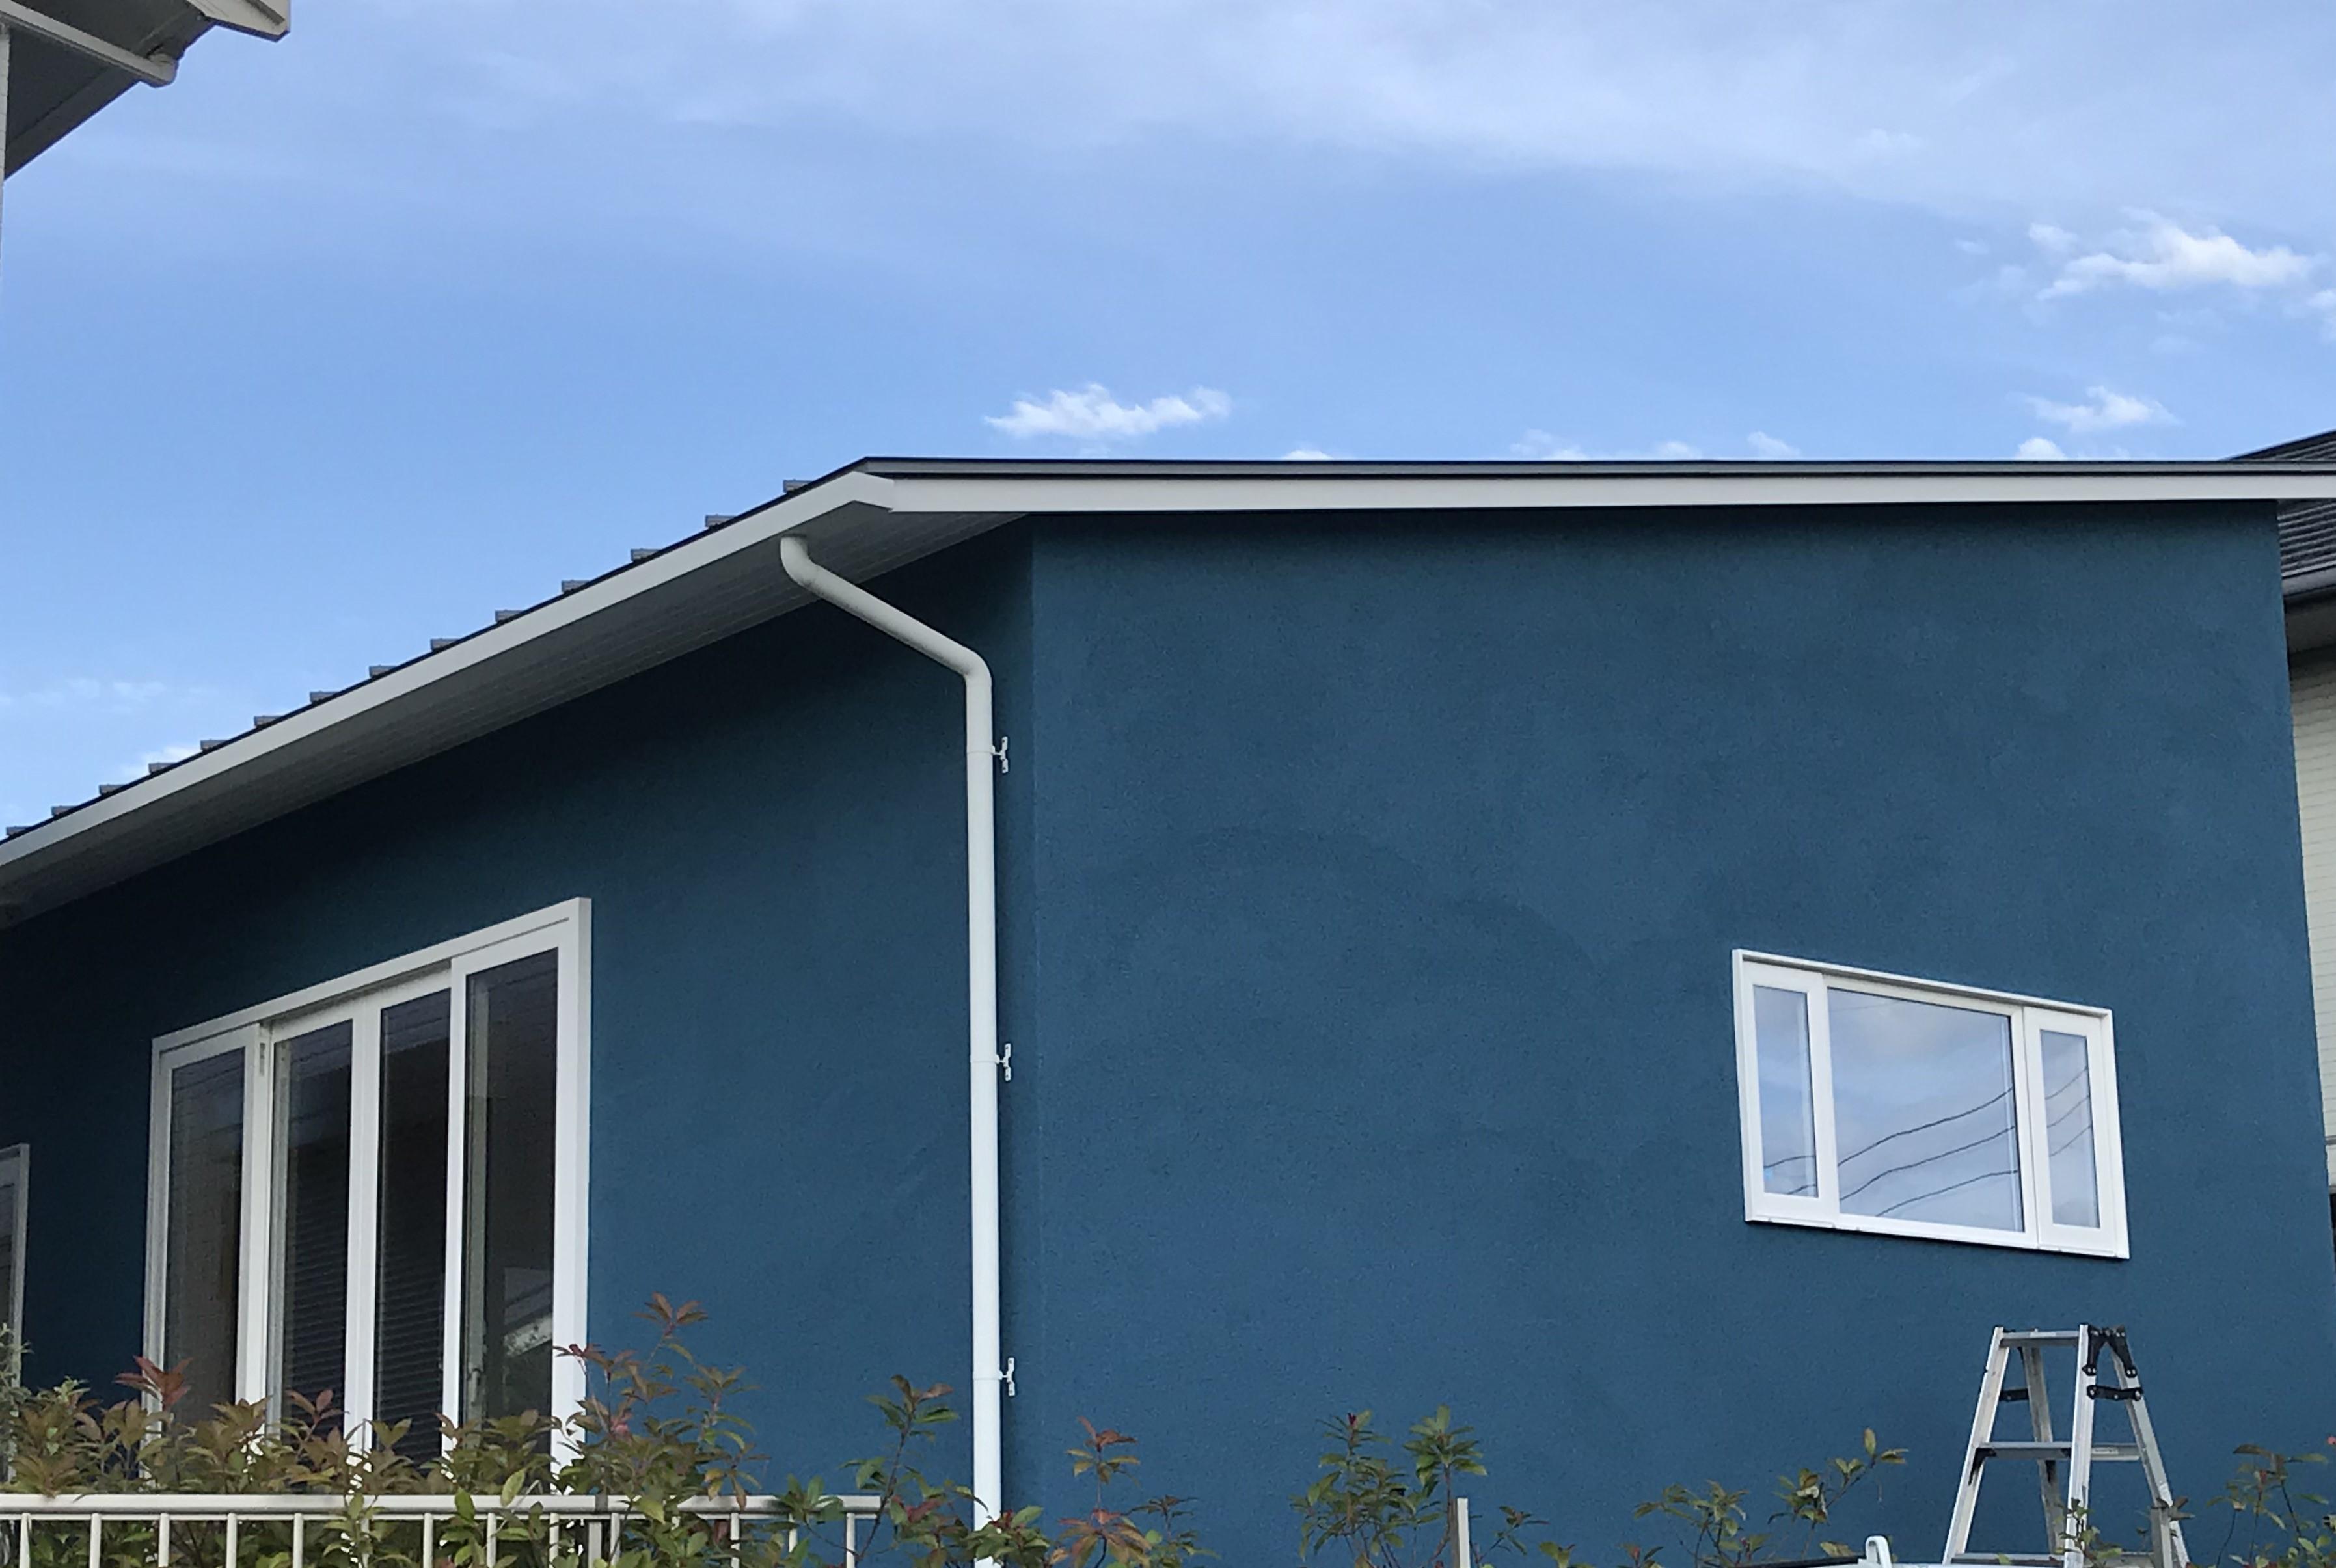 IMG_0312 - 坂井工務店 | 山口県山口市佐山 | 木造住宅、注文住宅の工務店